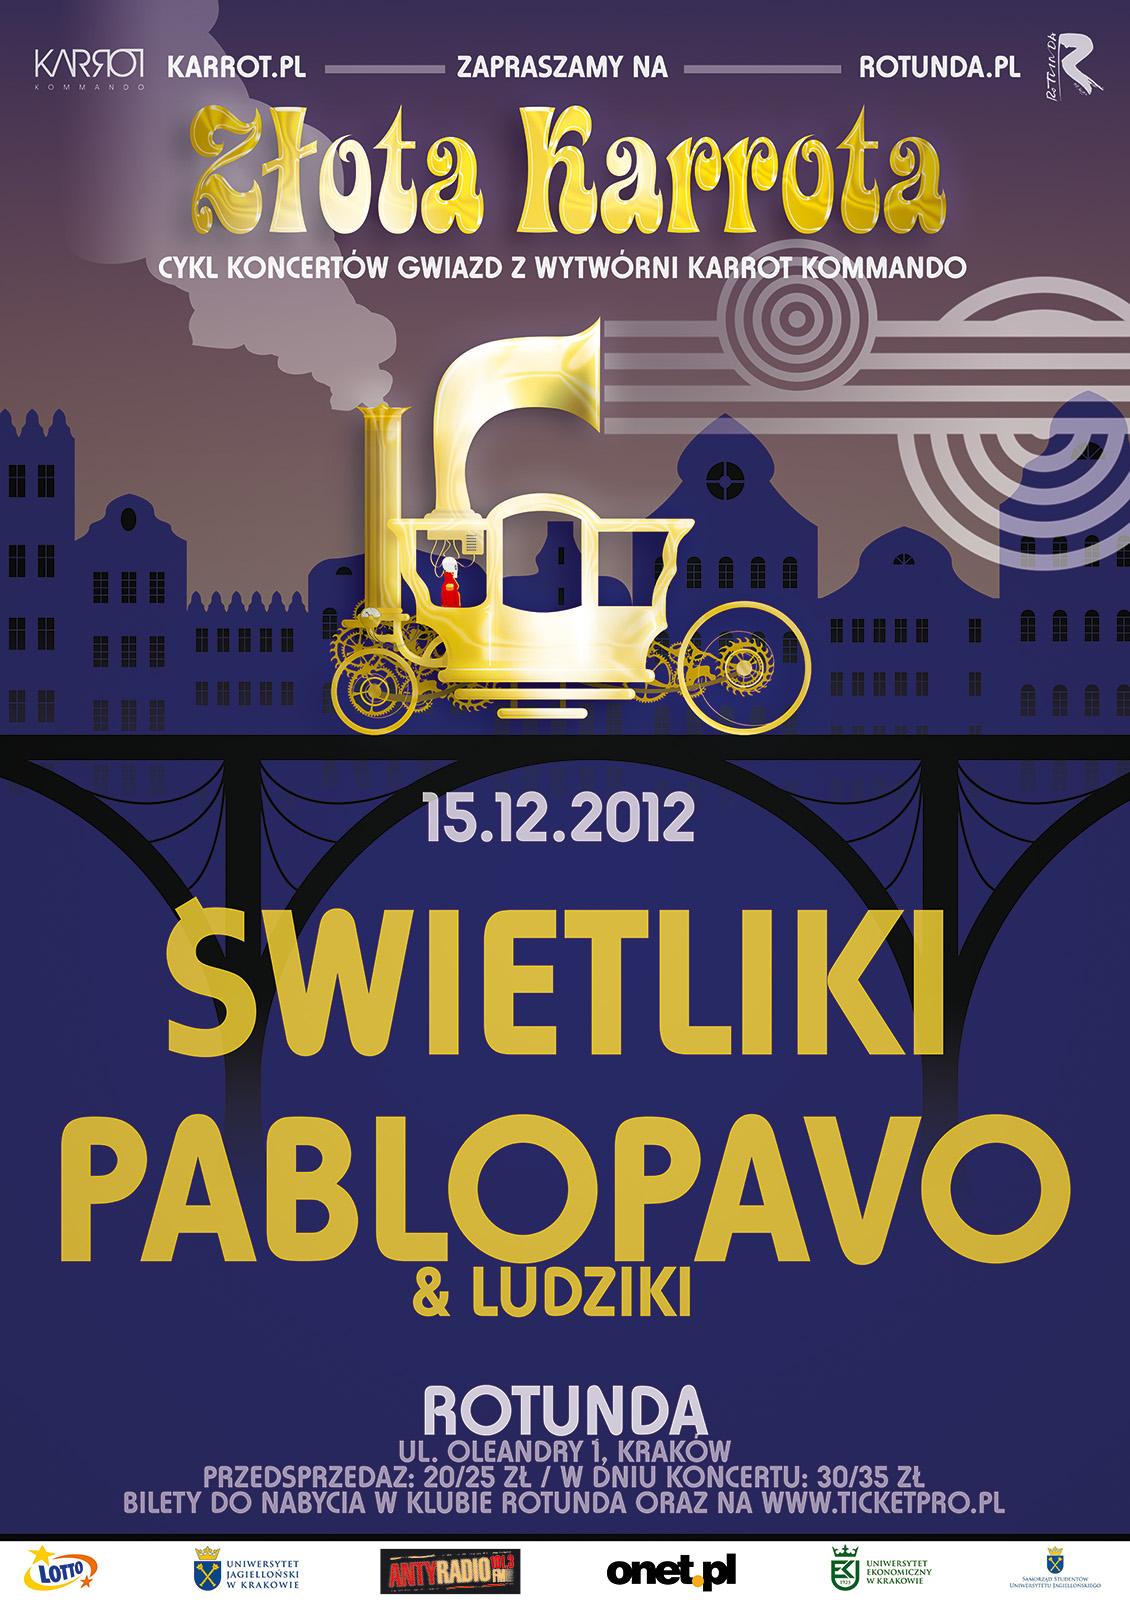 Świetliki oraz Pablopavo&Ludziki